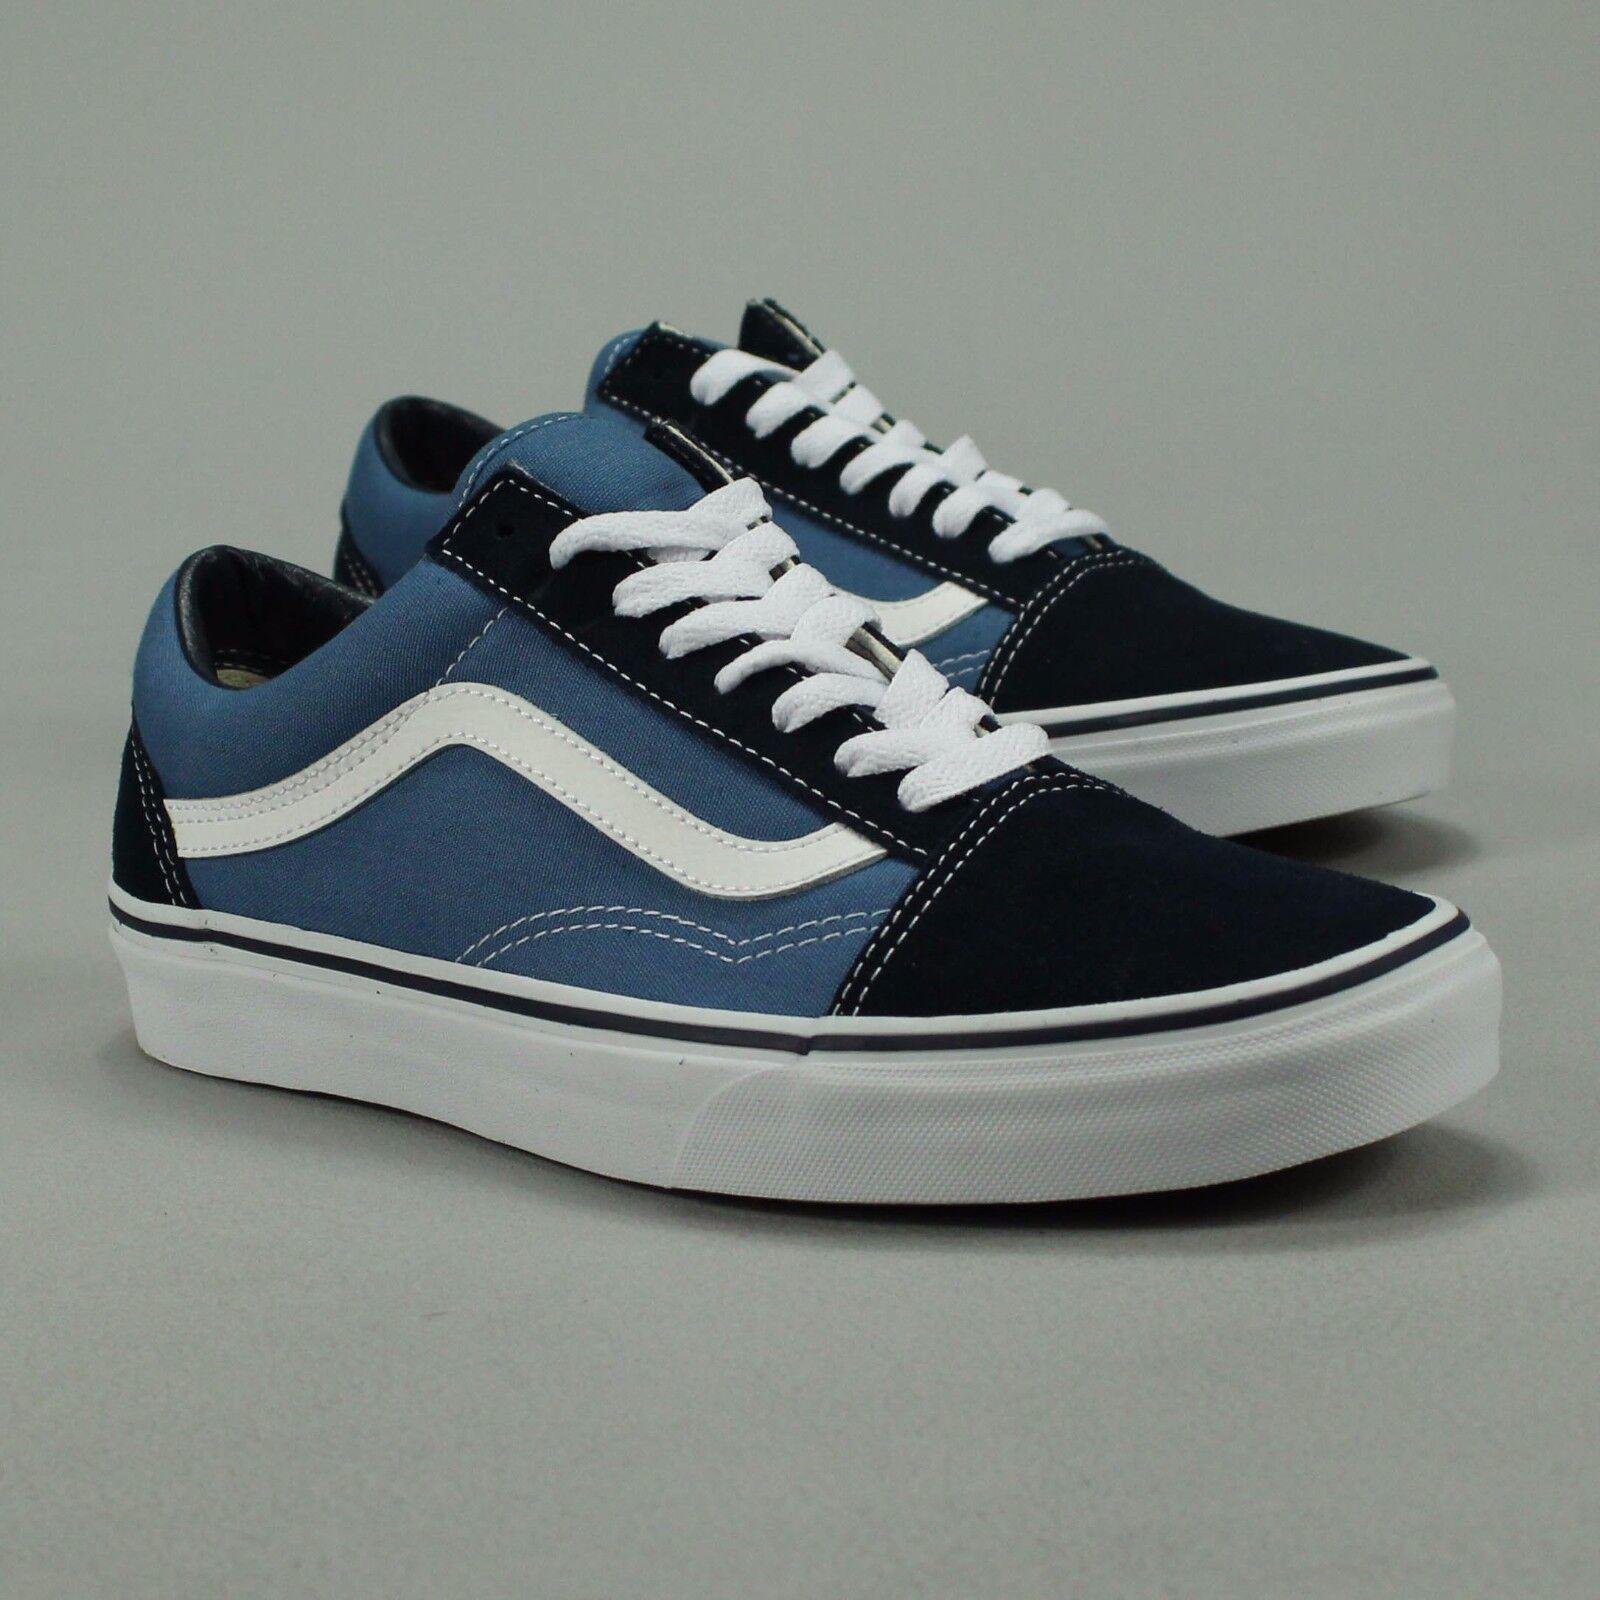 Vans Old New Skool Trainers Pumps Schuhes New Old in box UK Größe 4, 5, 6, 7, 8,9,10, de495b